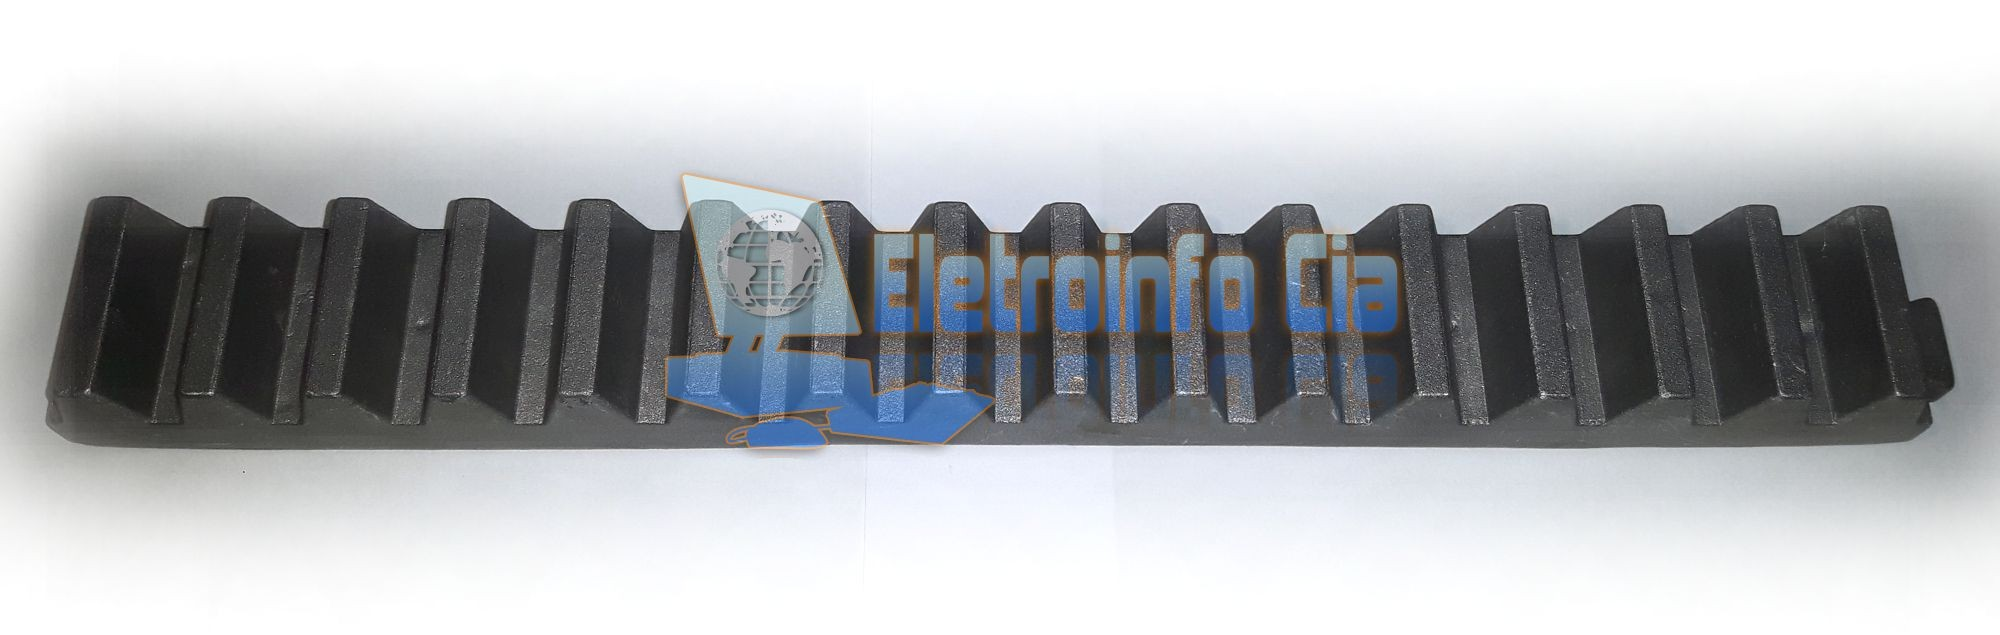 Gomo p/ Cremalheira p/ Motor Deslizante Industrial Alumínio 30CM Garen